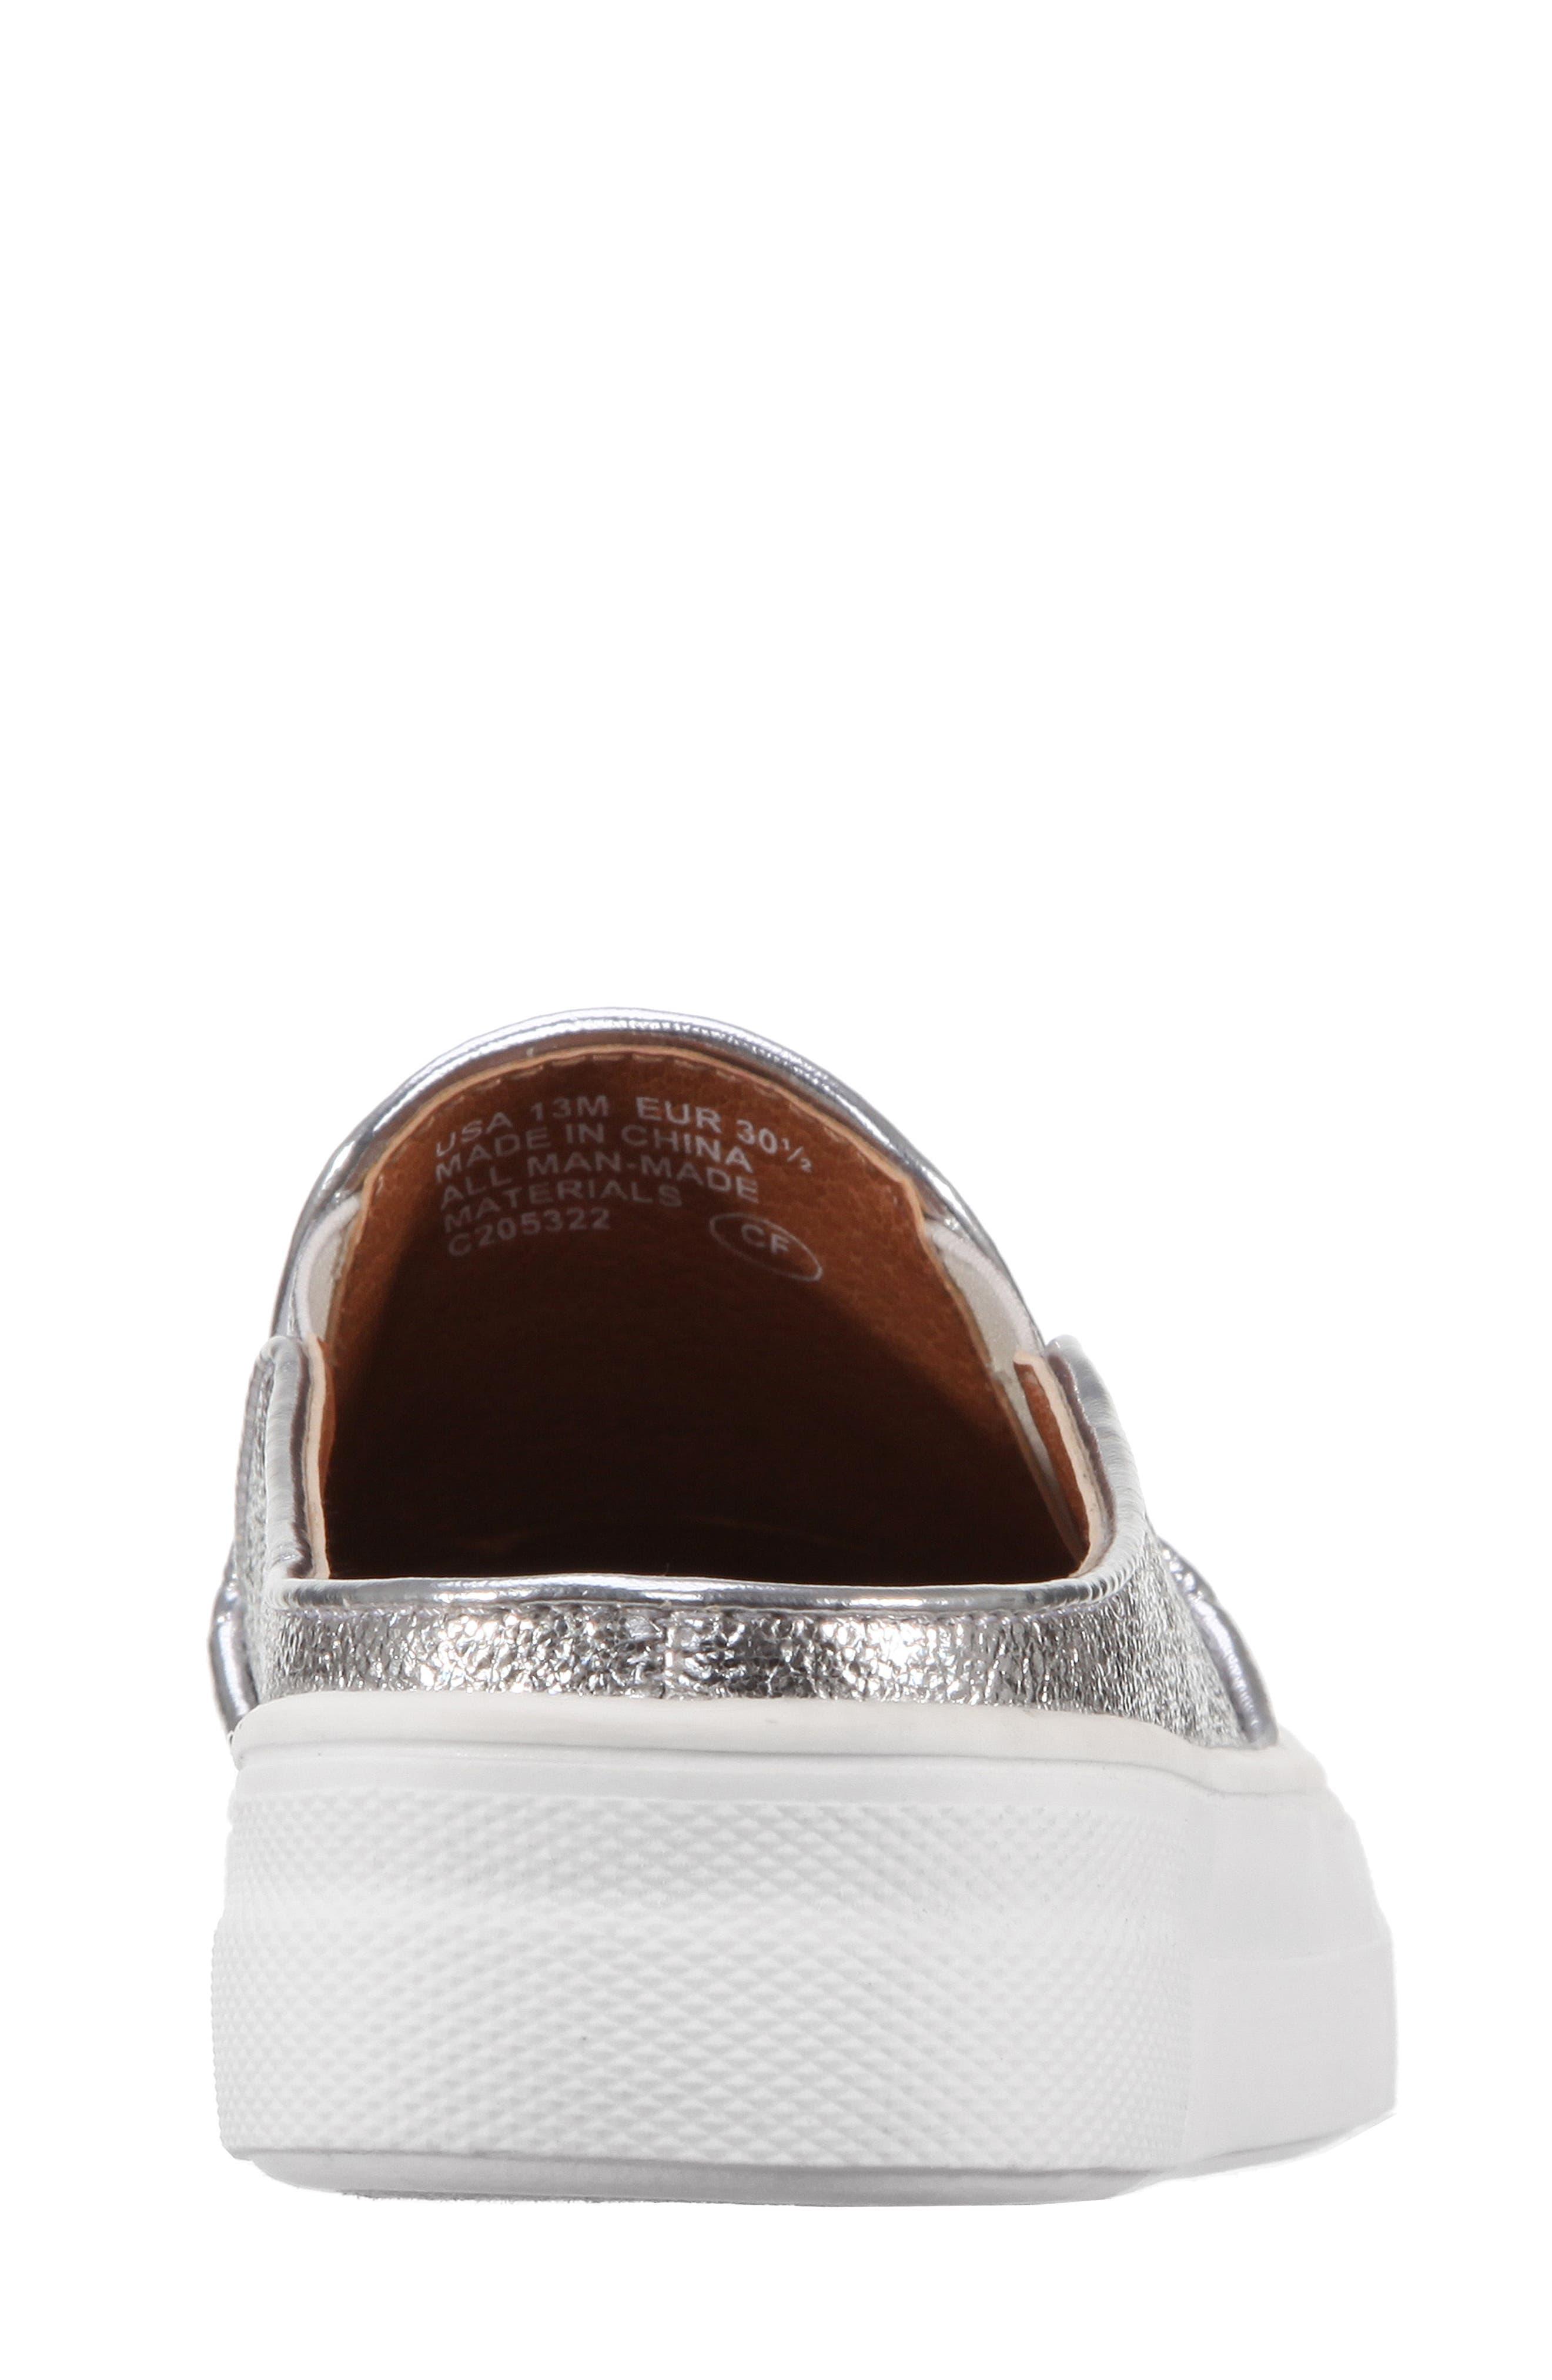 Gail Metallic Slip-On Sneaker Mule,                             Alternate thumbnail 2, color,                             044